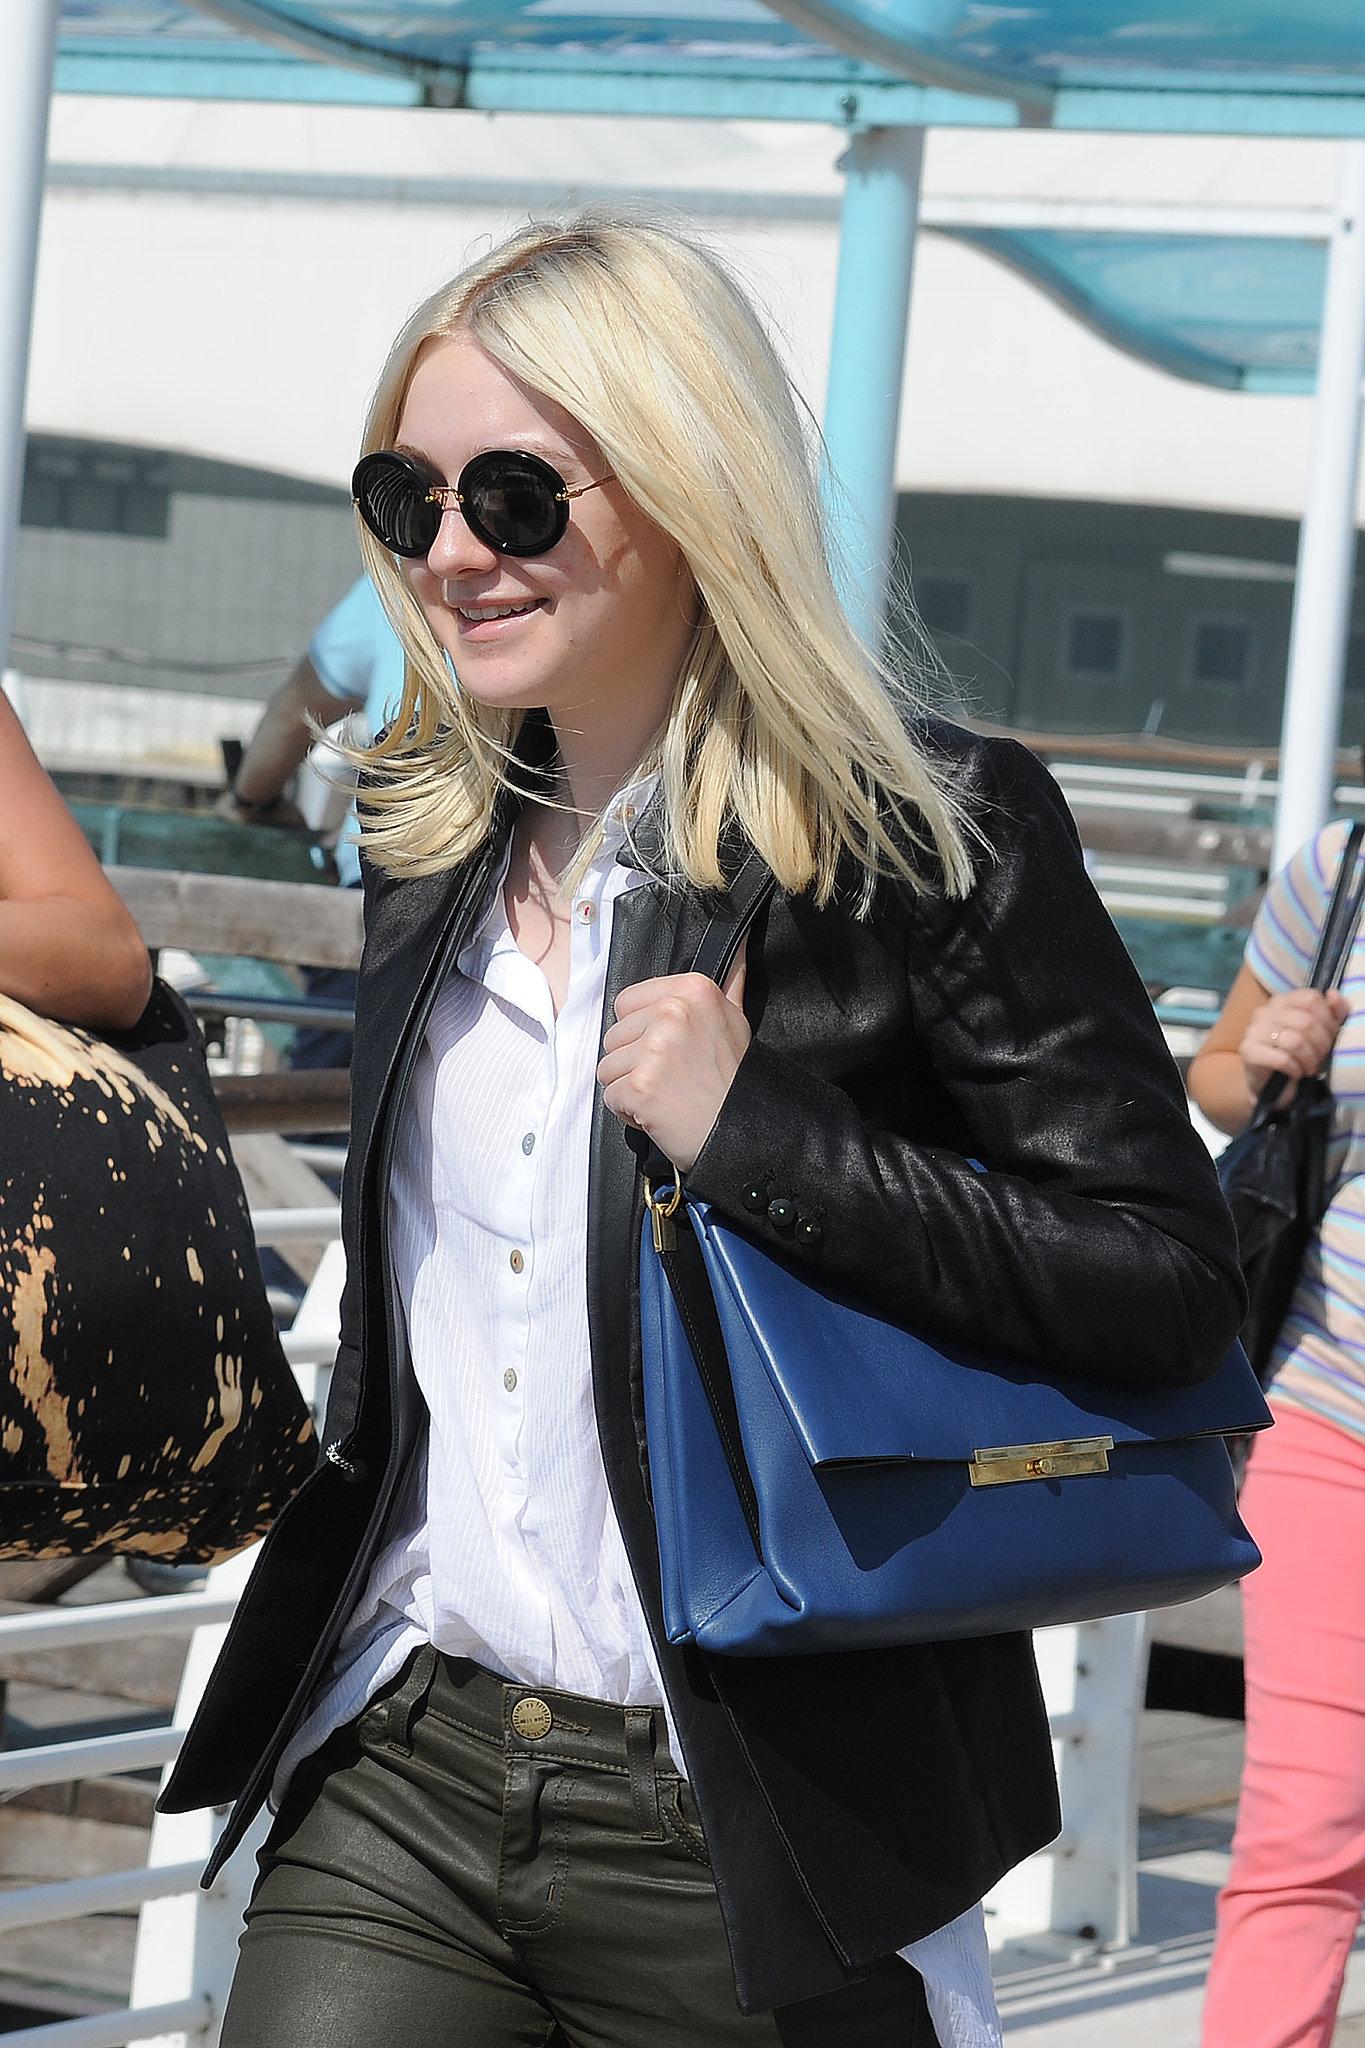 Dakota Fanning arrived at the Venice airport.